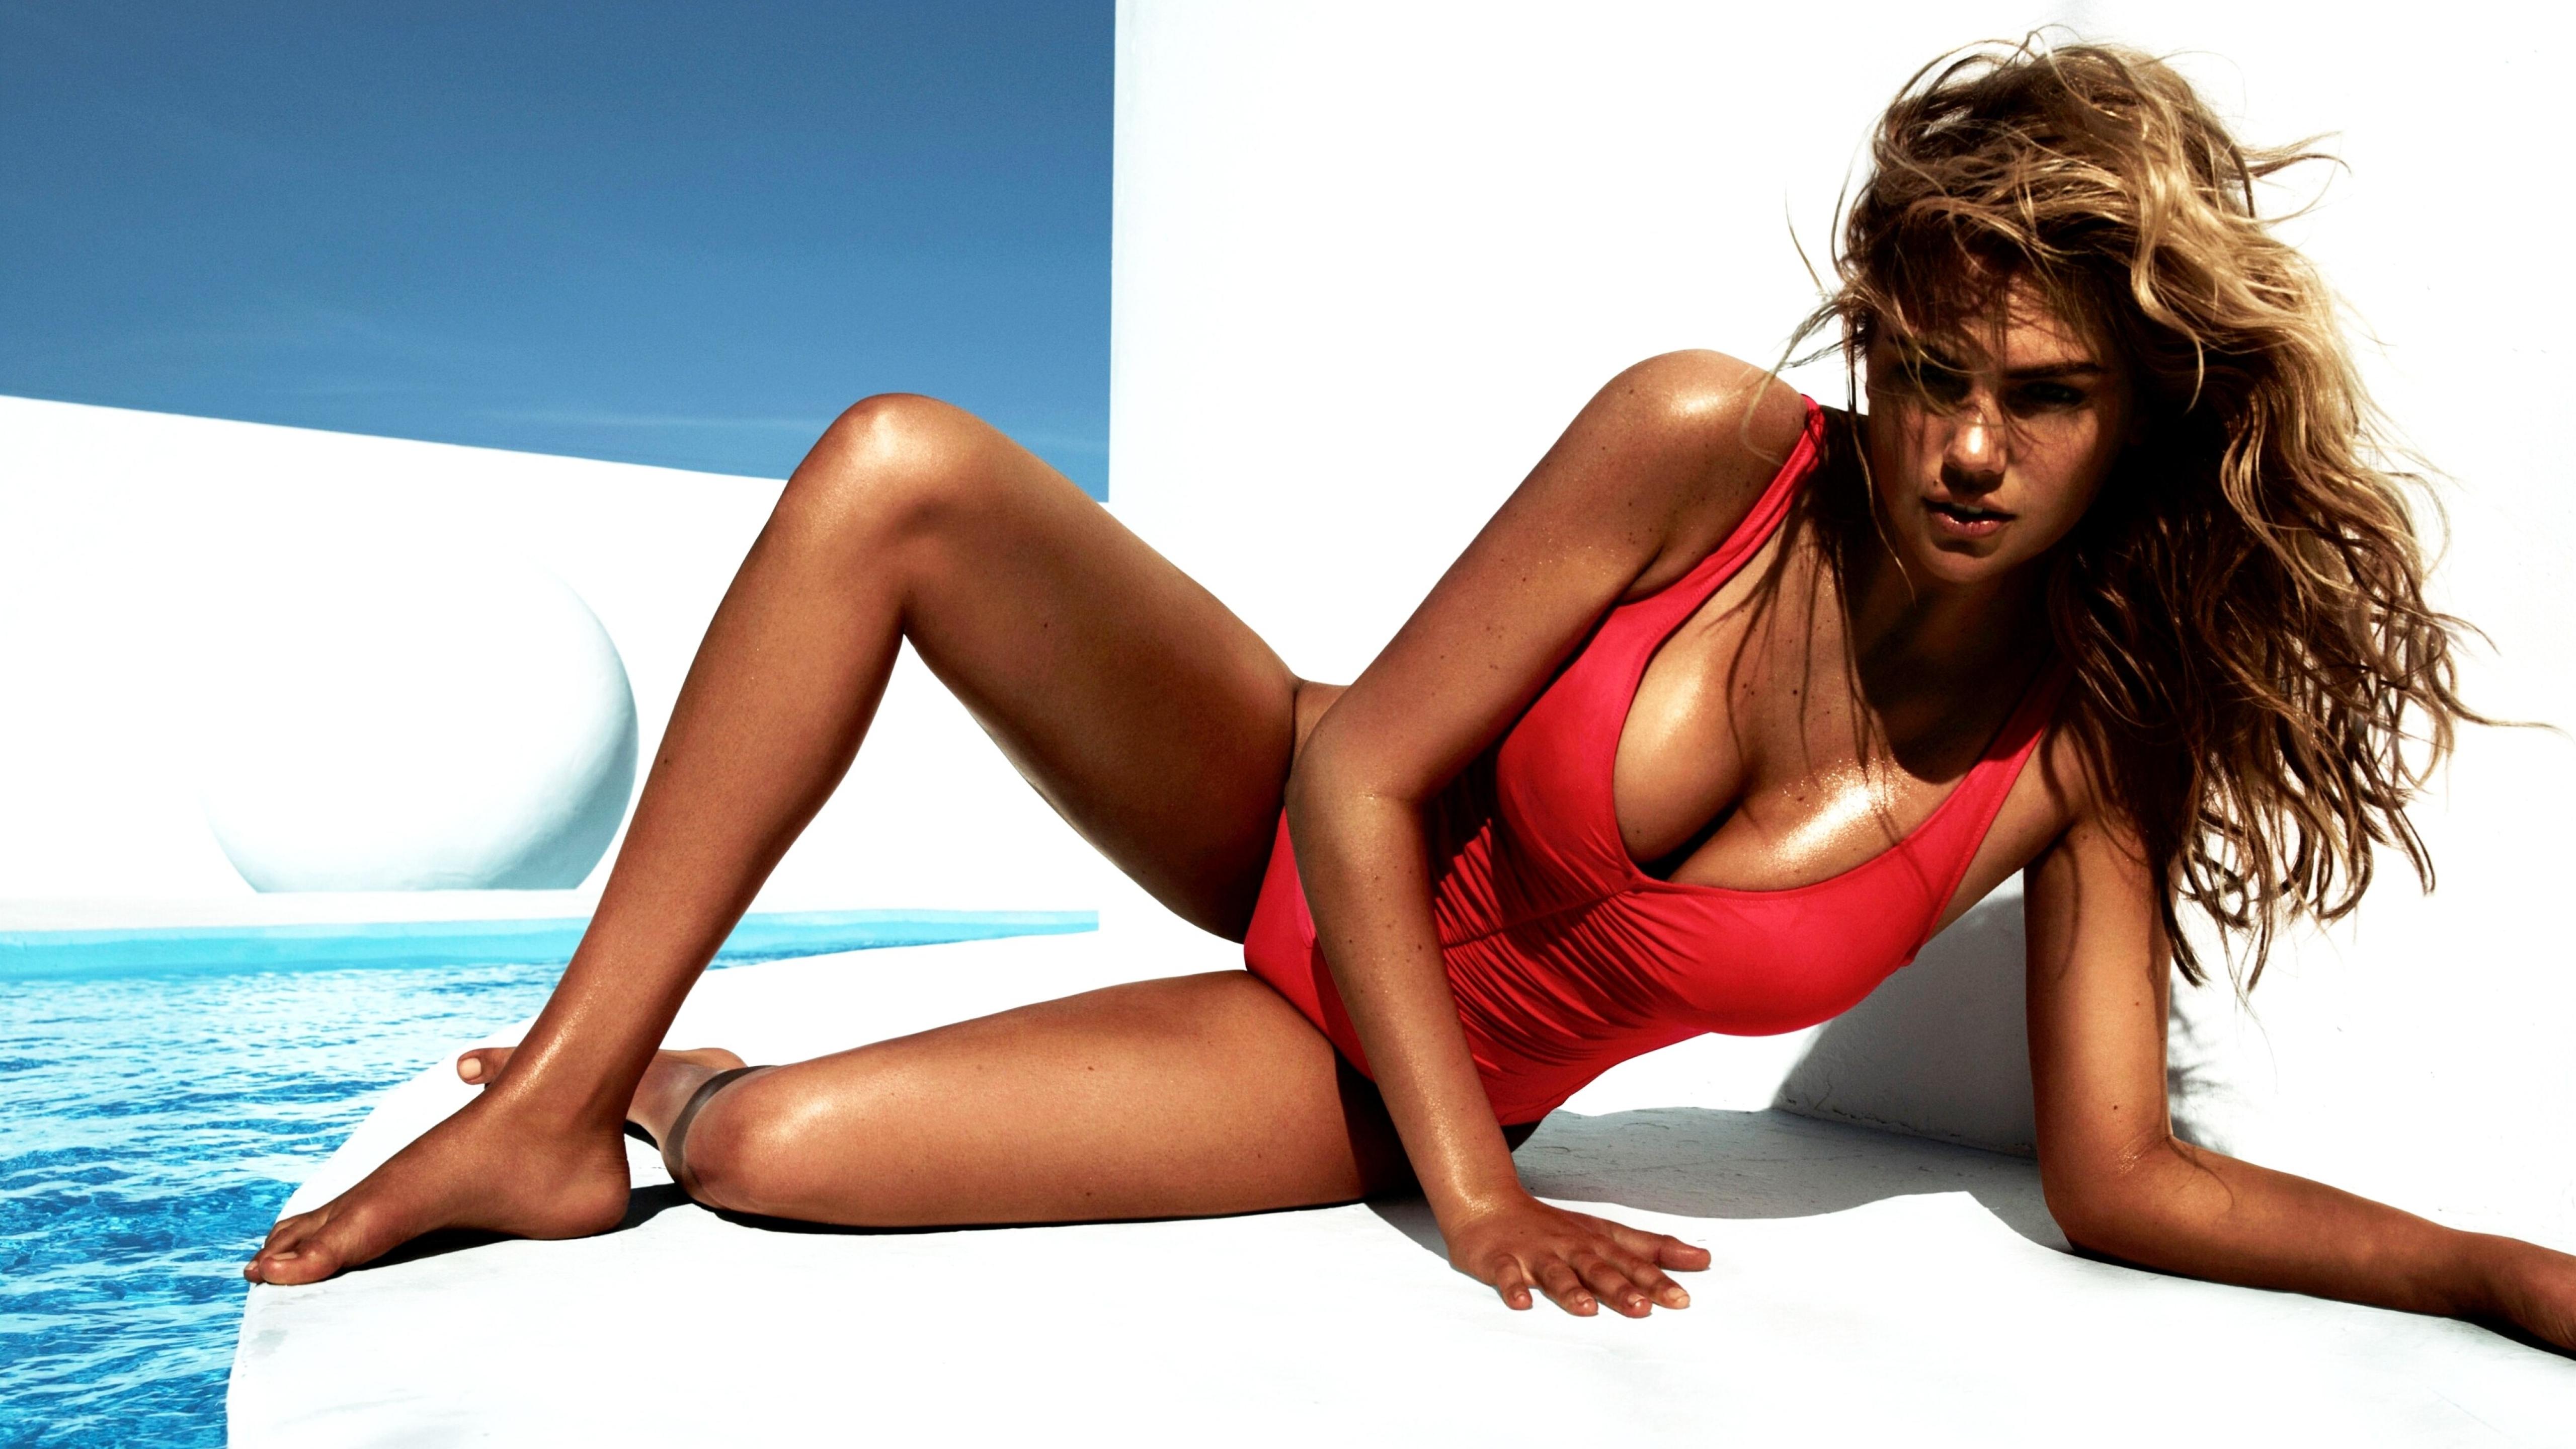 Kate upton bikini hd 4k wallpaper - Hd bikini wallpaper download ...